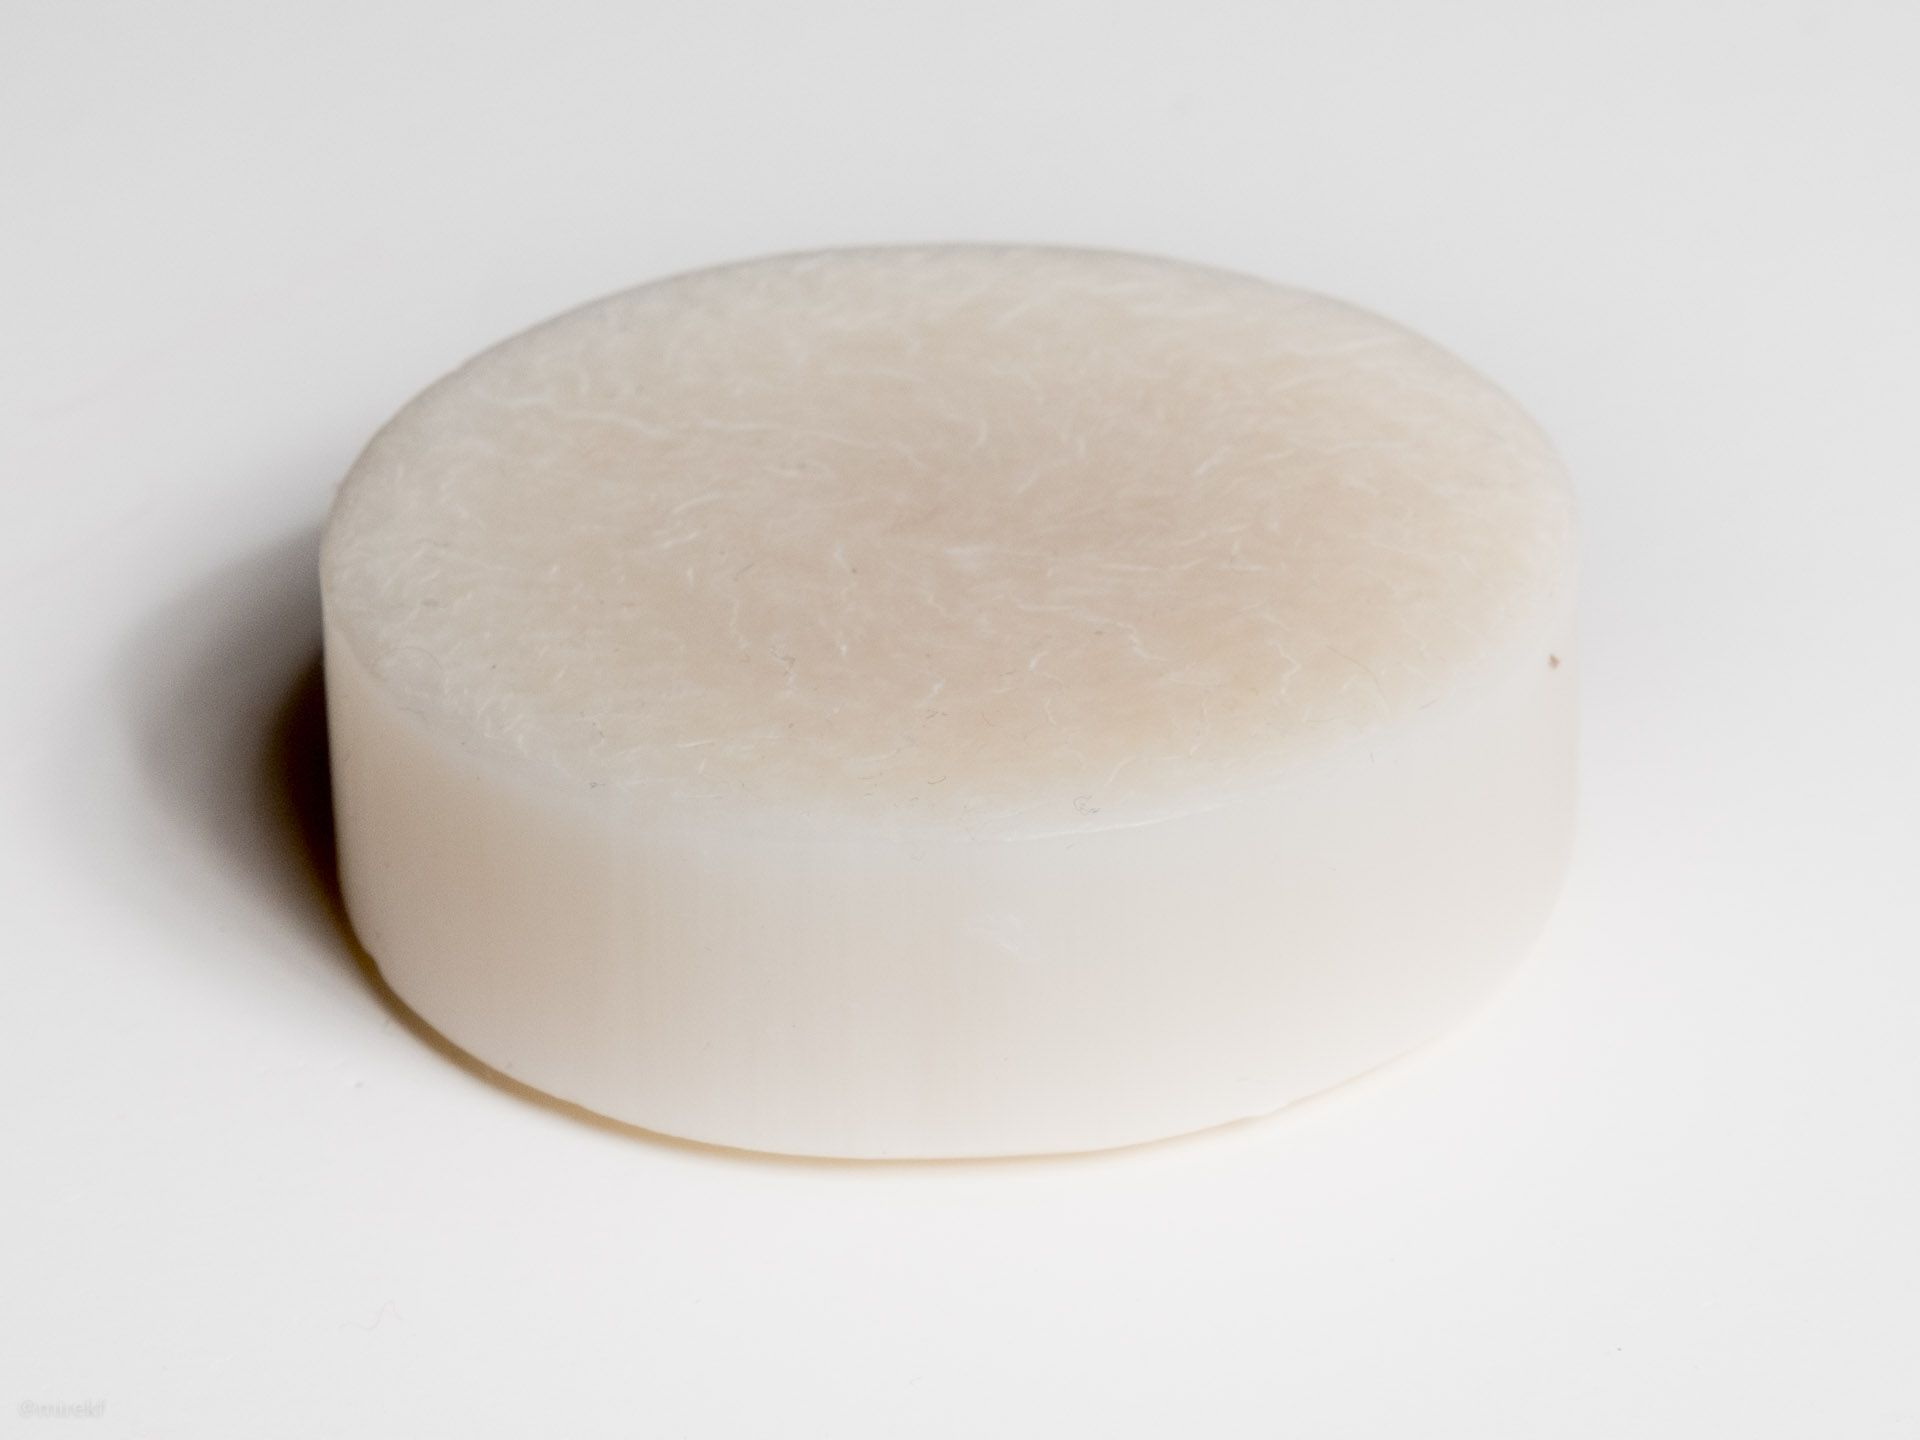 Krążek mydła Savon du midi Savon à barbe Santal